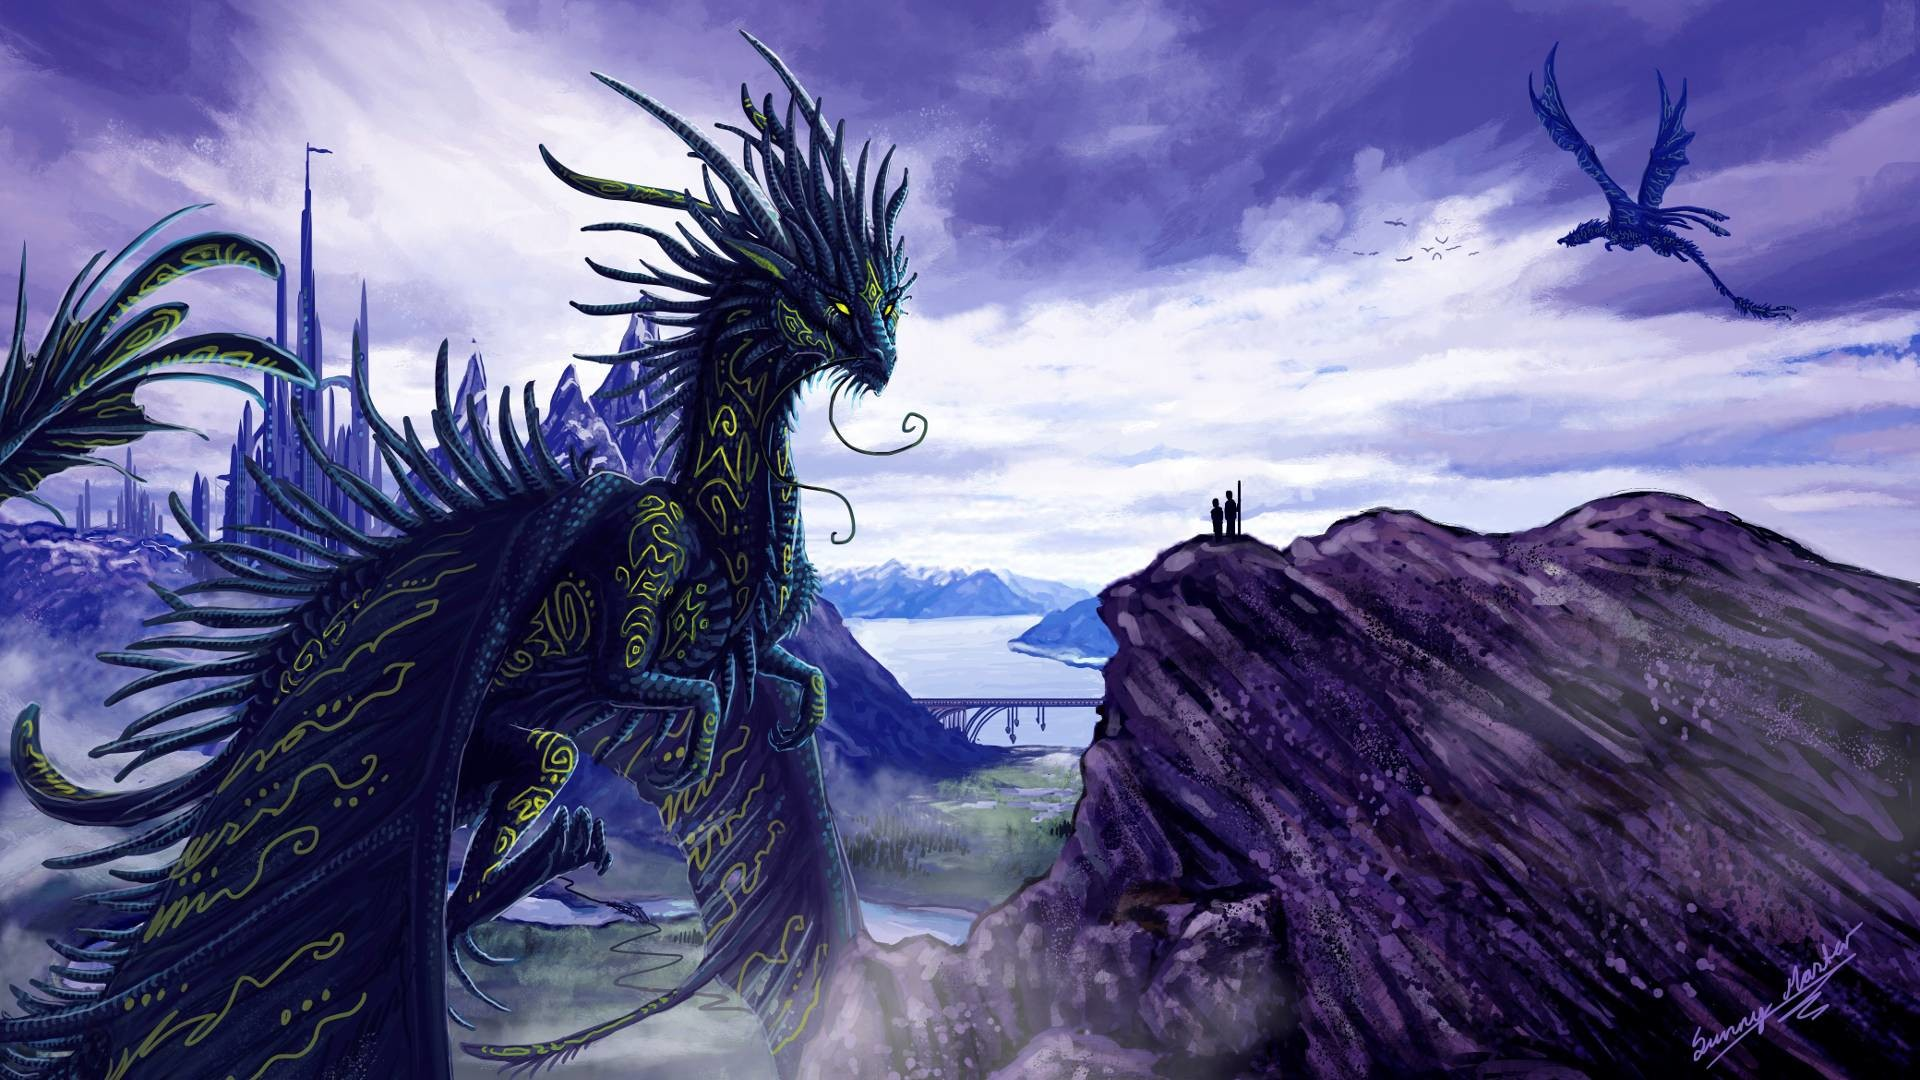 Wallpapers For > Fantasy Dragon Wallpaper